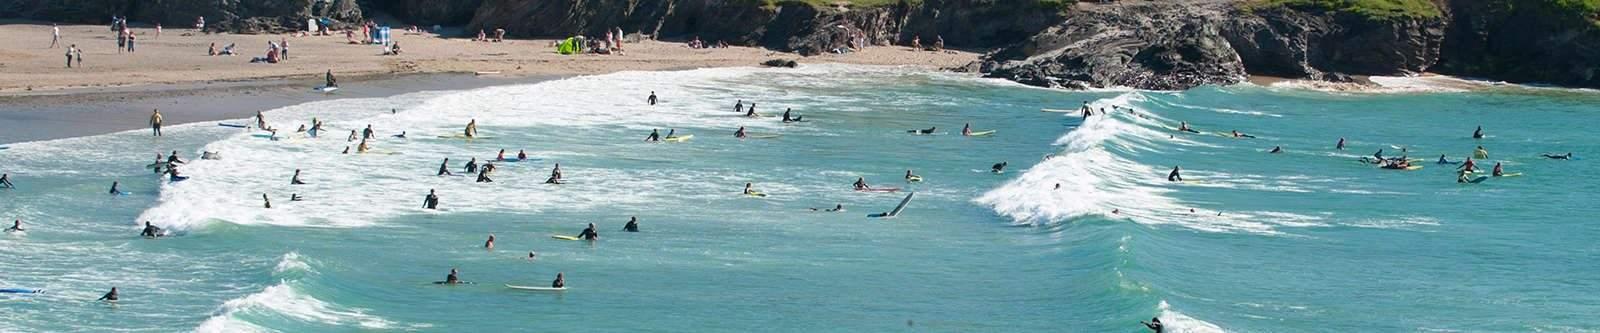 surfers at Polzeath